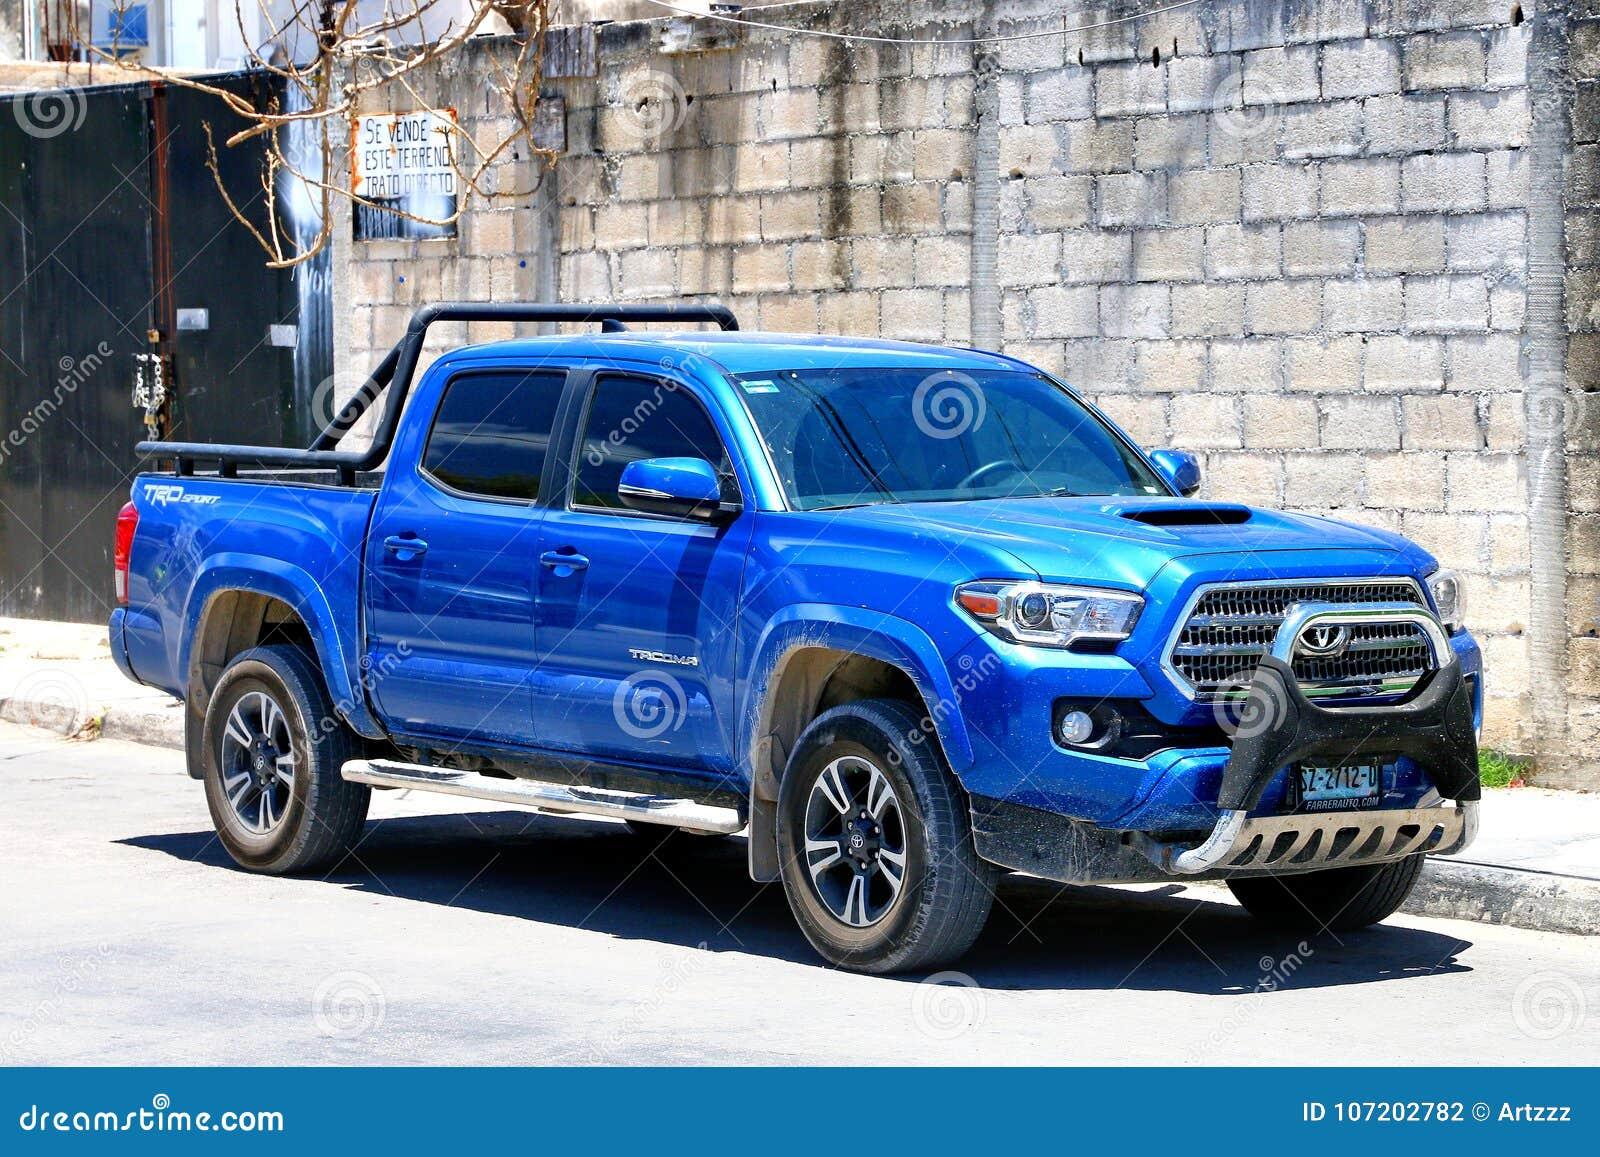 Toyota Tacoma Editorial Photography Image Of Machine 107202782